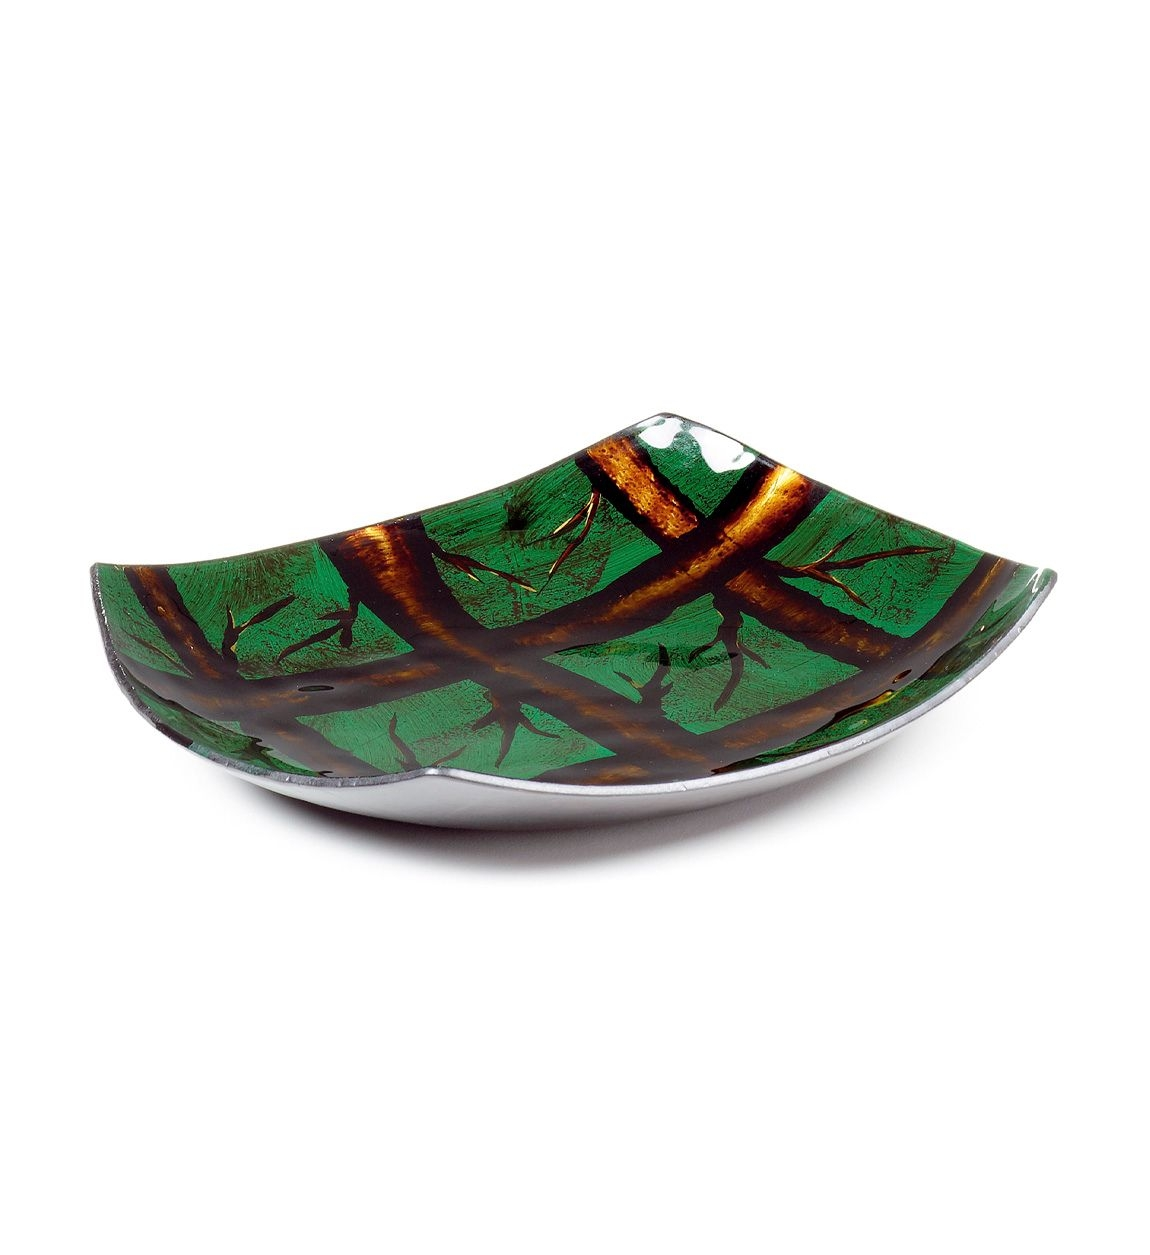 Platou decorativ din sticla Arizona Round Verde / Maro, Ø25xH3,5 cm poza